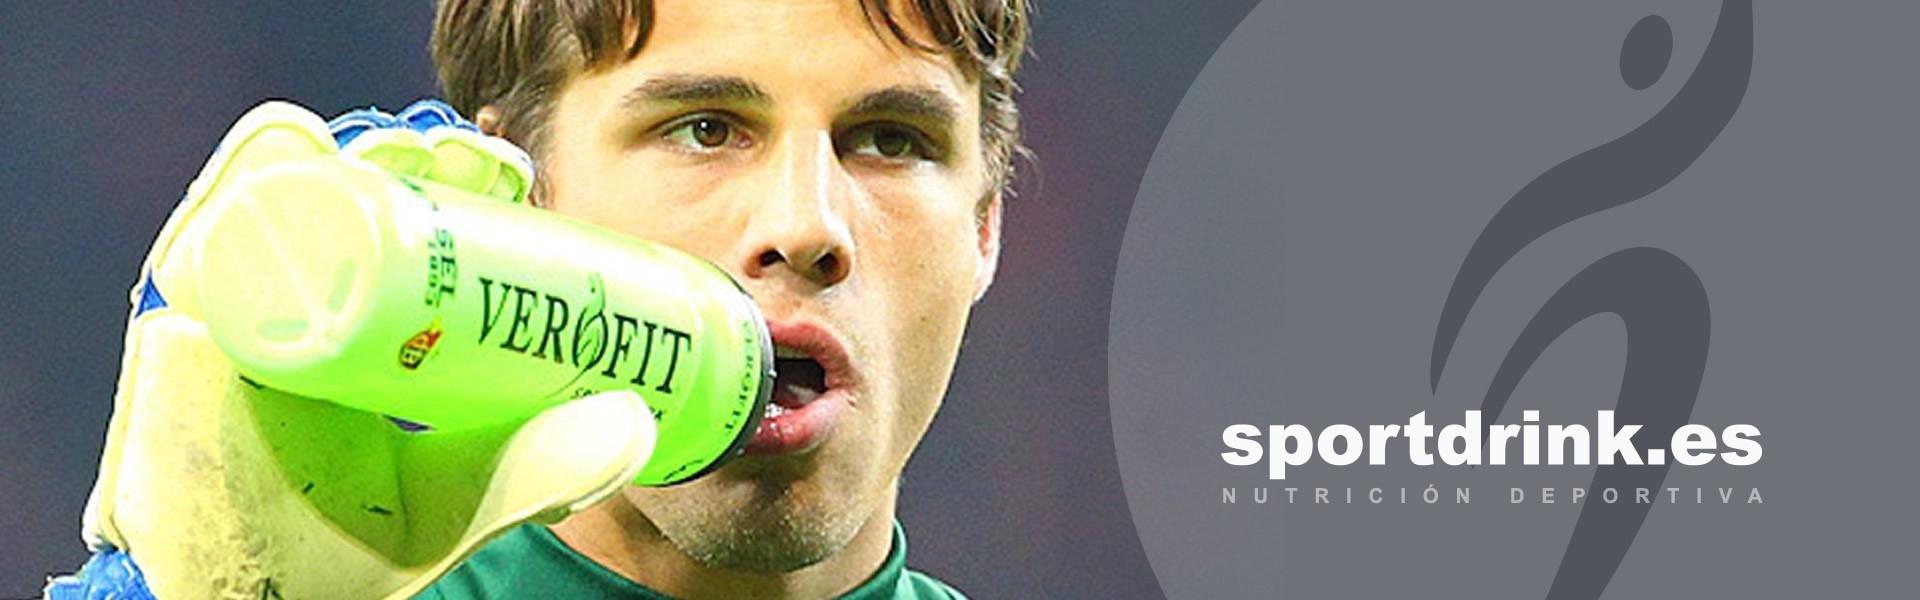 https://www.sportdrink.es/modules/homeslider/images/4da545cad15075069efdc570ec71e2d35d62f1dc_portero%201.jpg